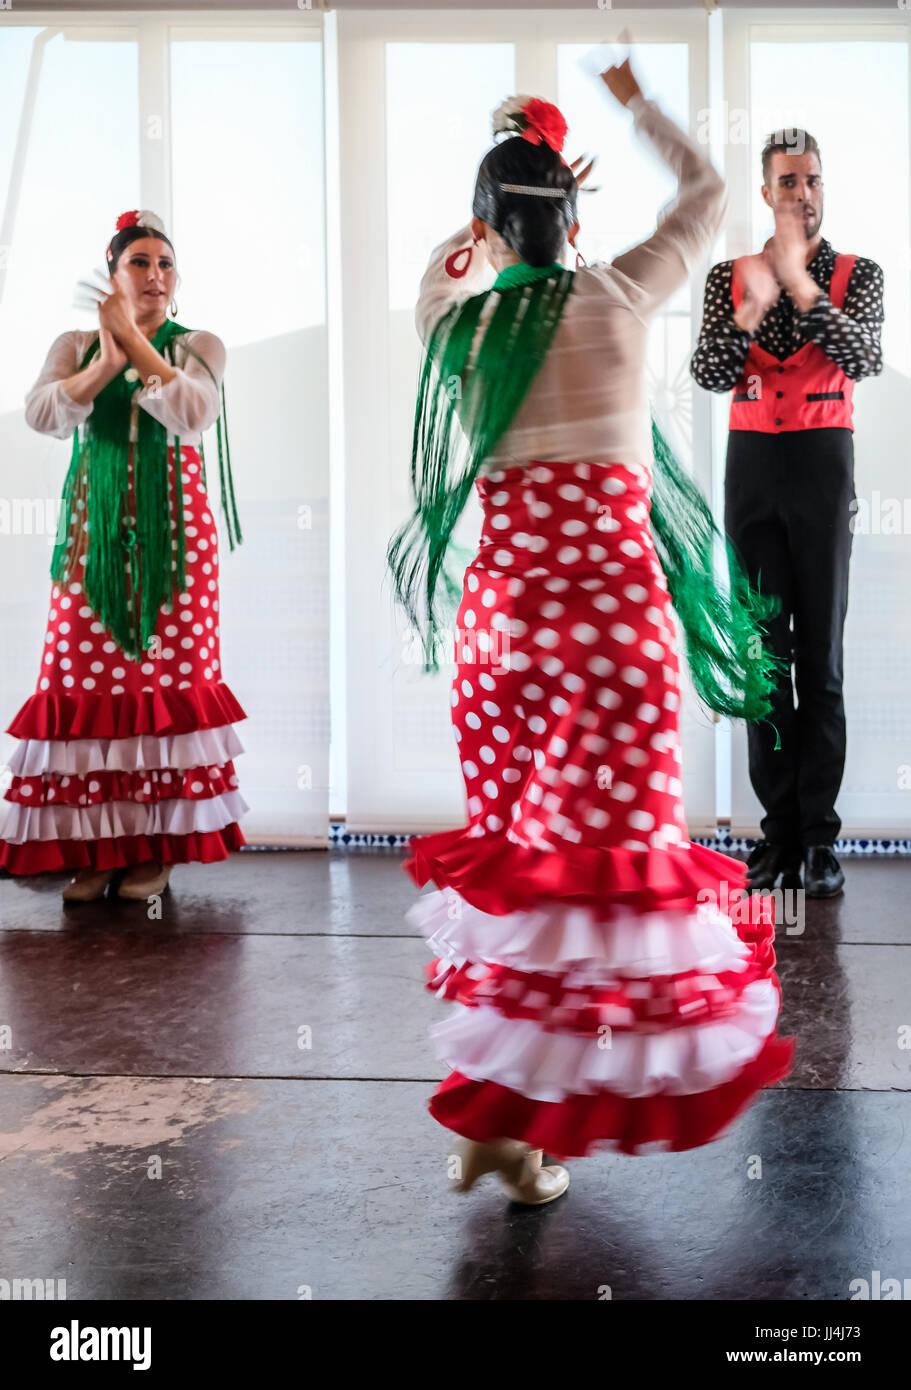 CALAHONDA, ANDALUCIA/SPAIN - JULY 3 : Flamenco Dancing at Calahonda Costa del Sol Spain on July 3, 2017. Unidentified - Stock Image